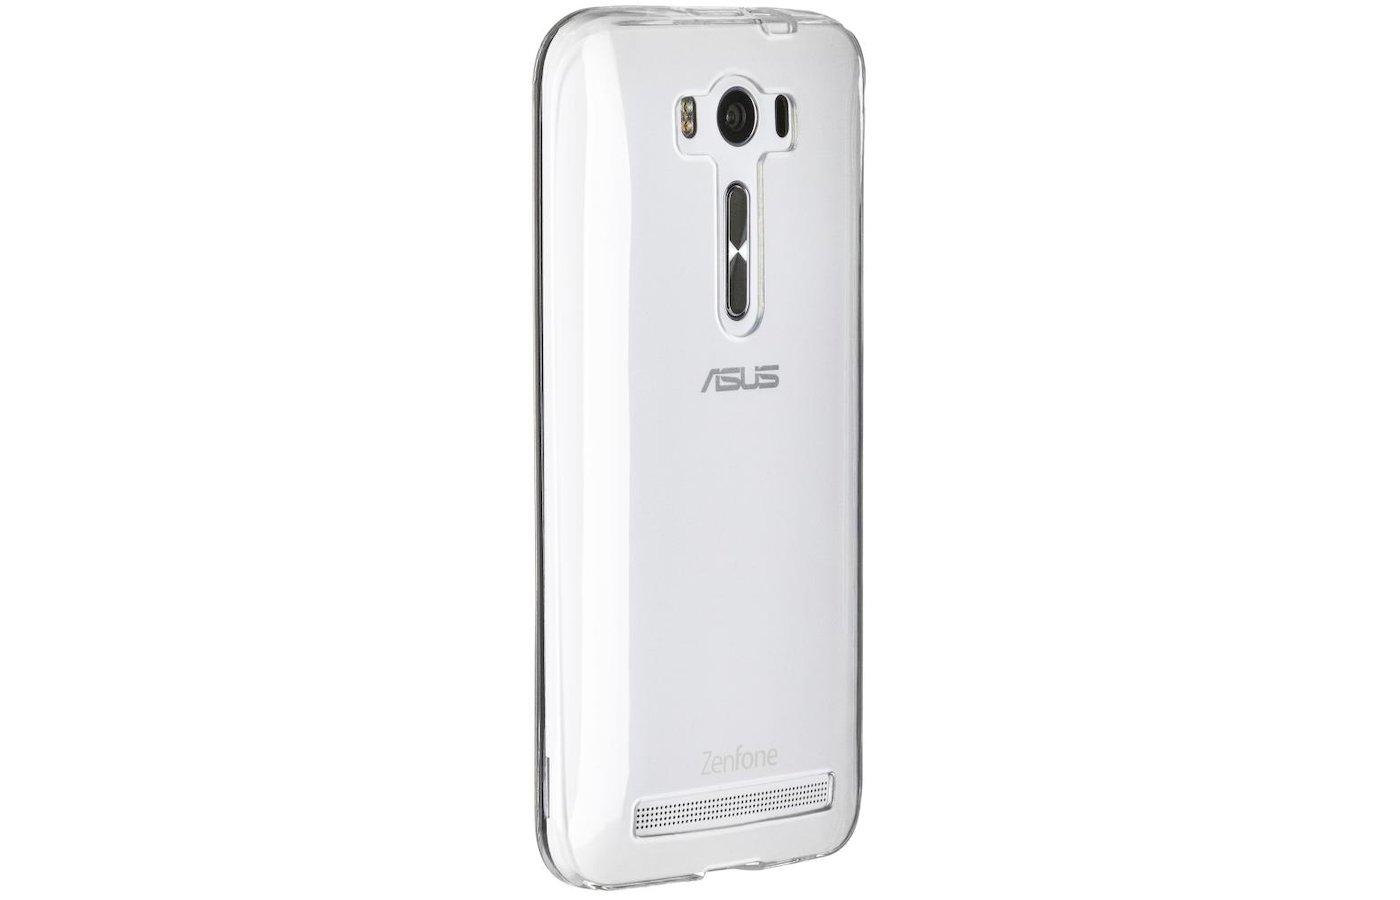 Чехол iBox Crystal для Asus ZenFone 2 Lazer (ZE500KL/ZE500KG) прозрачный